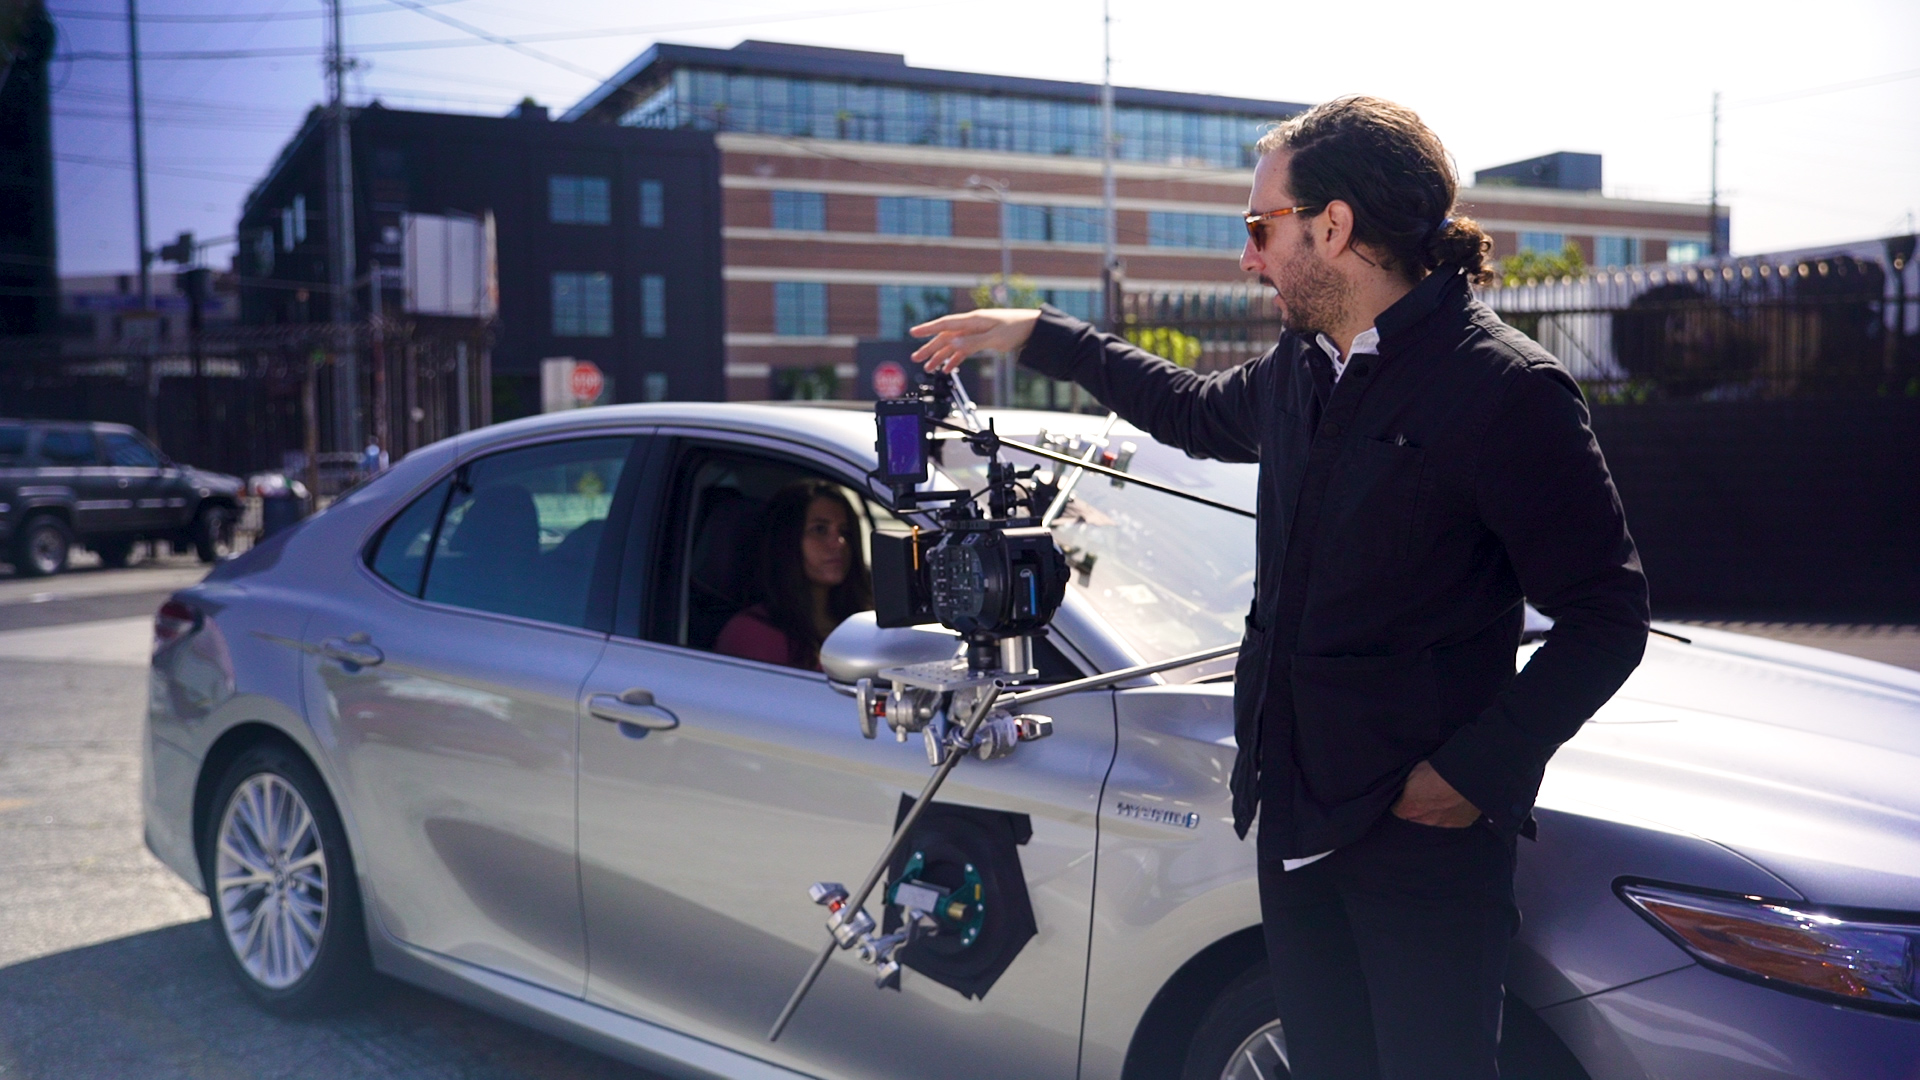 'Camino a Marte' Director Beto Hinojosa Teaches Us How to Rig a Car for a Movie Scene